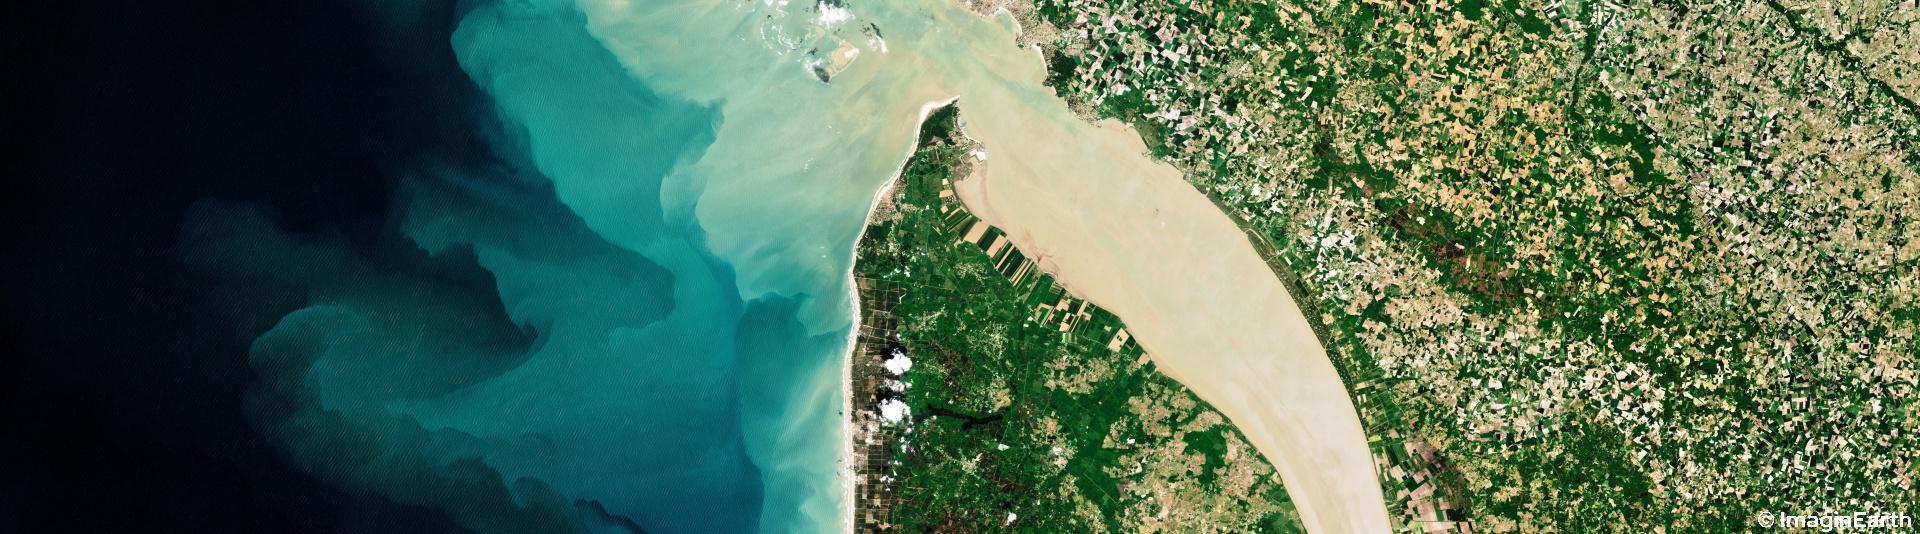 travel-france-satellite-imaginearth